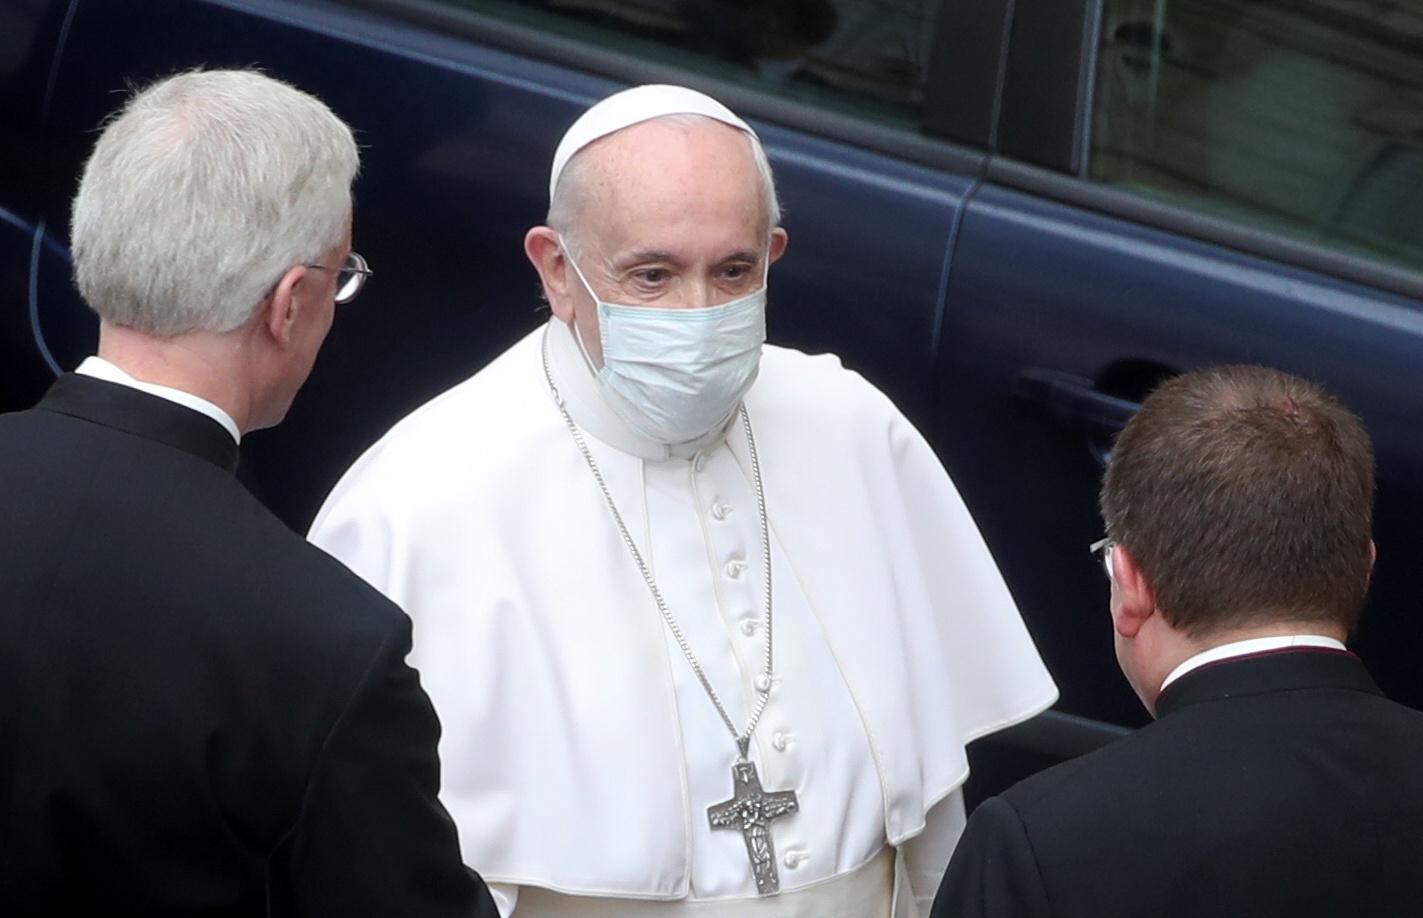 Pope Francis arrives at the San Damaso courtyard for the weekly general audience at the Vatican, May 19, 2021. REUTERS/Yara Nardi